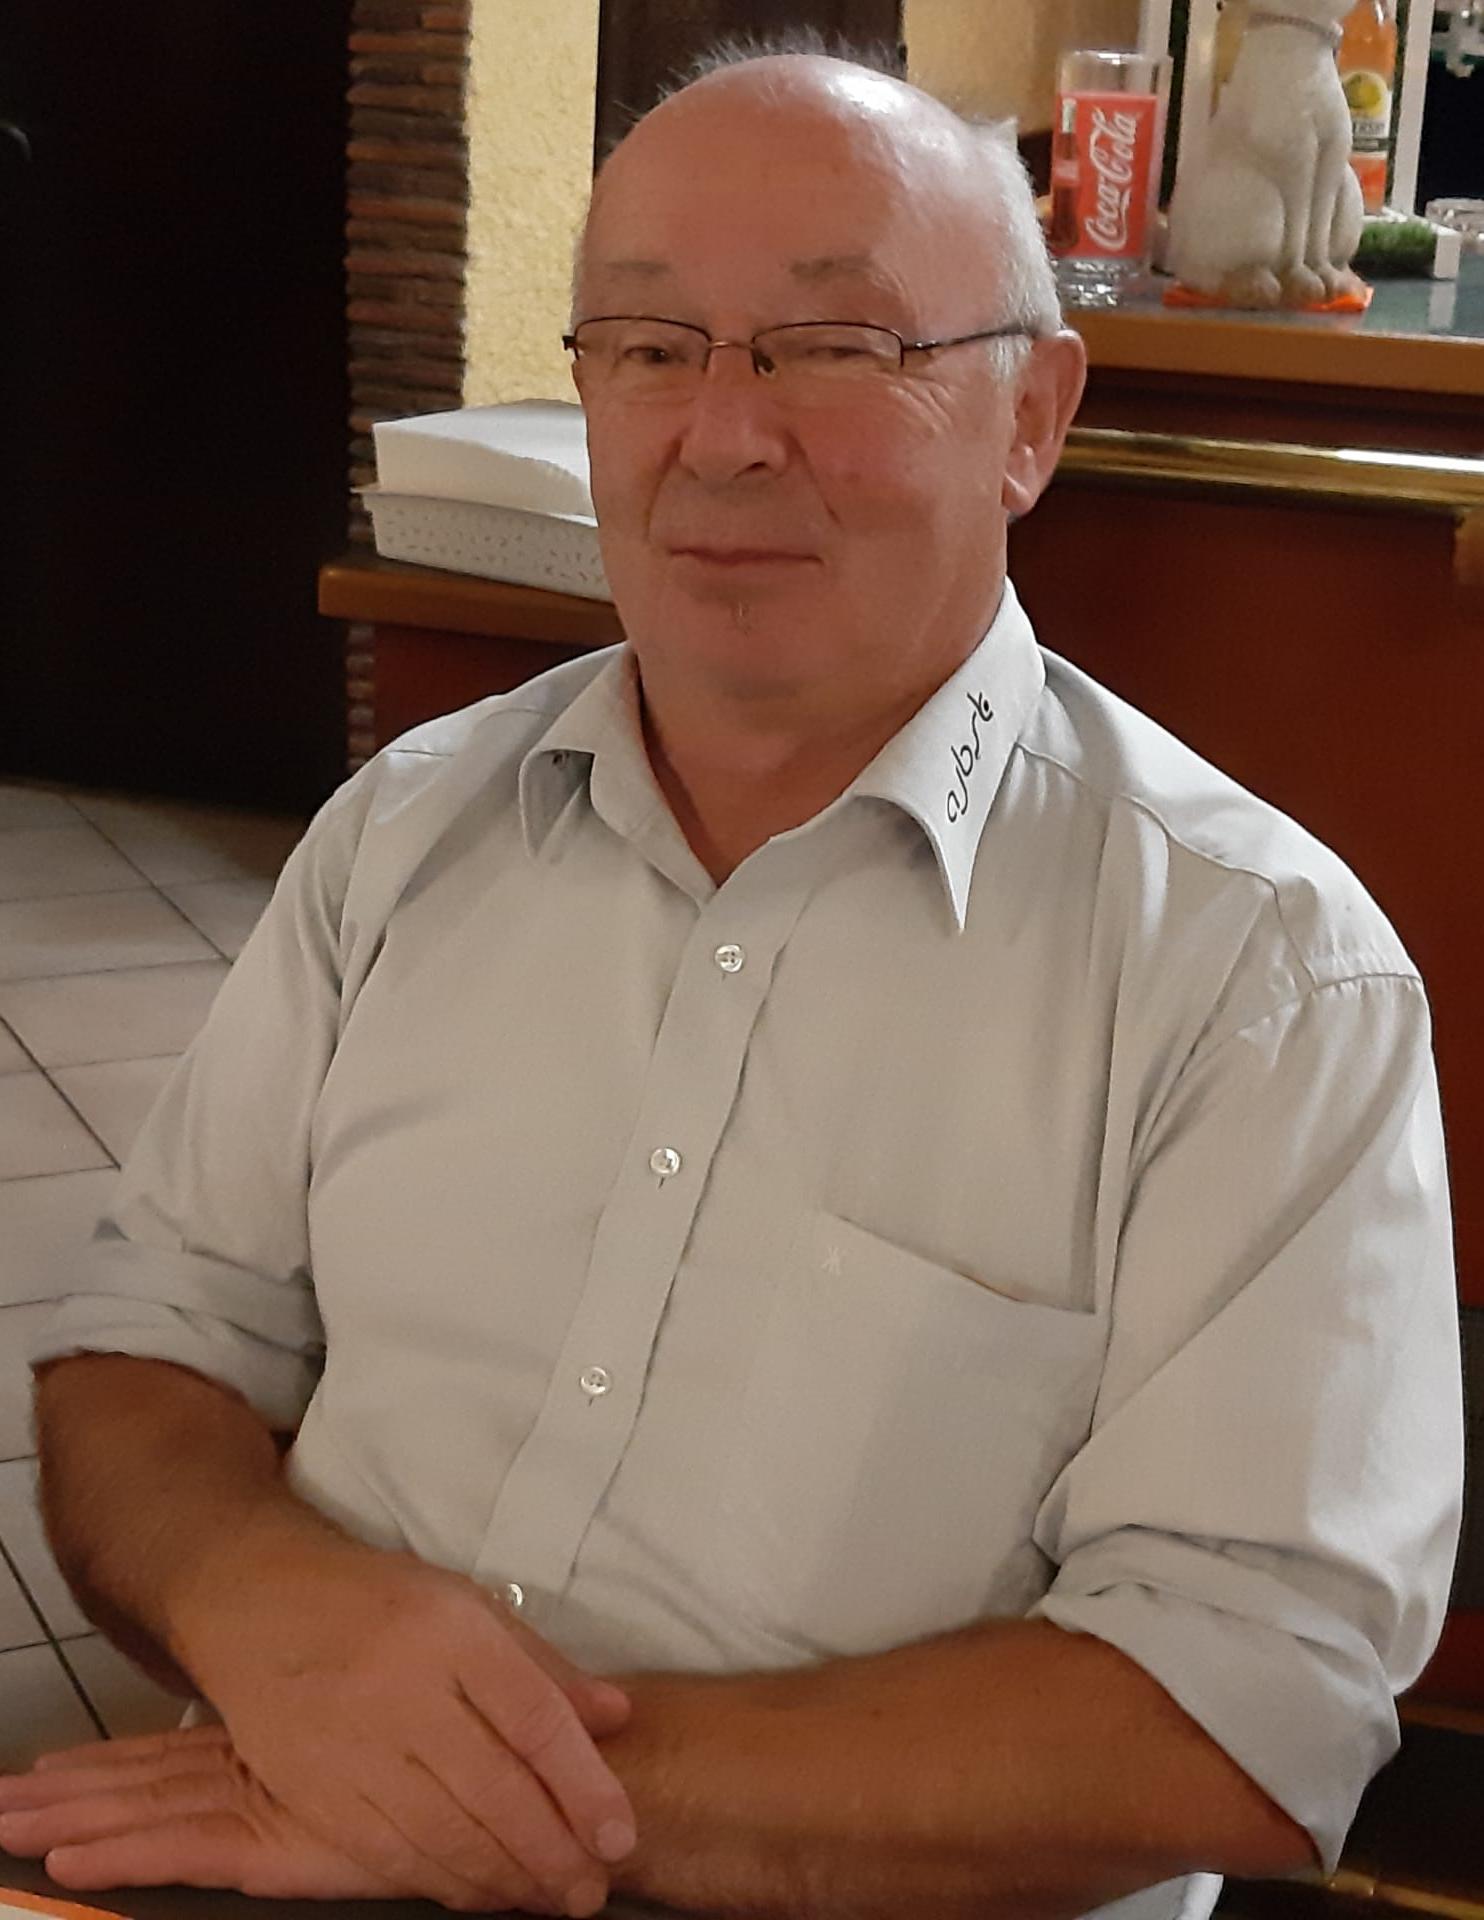 Michel Erwin